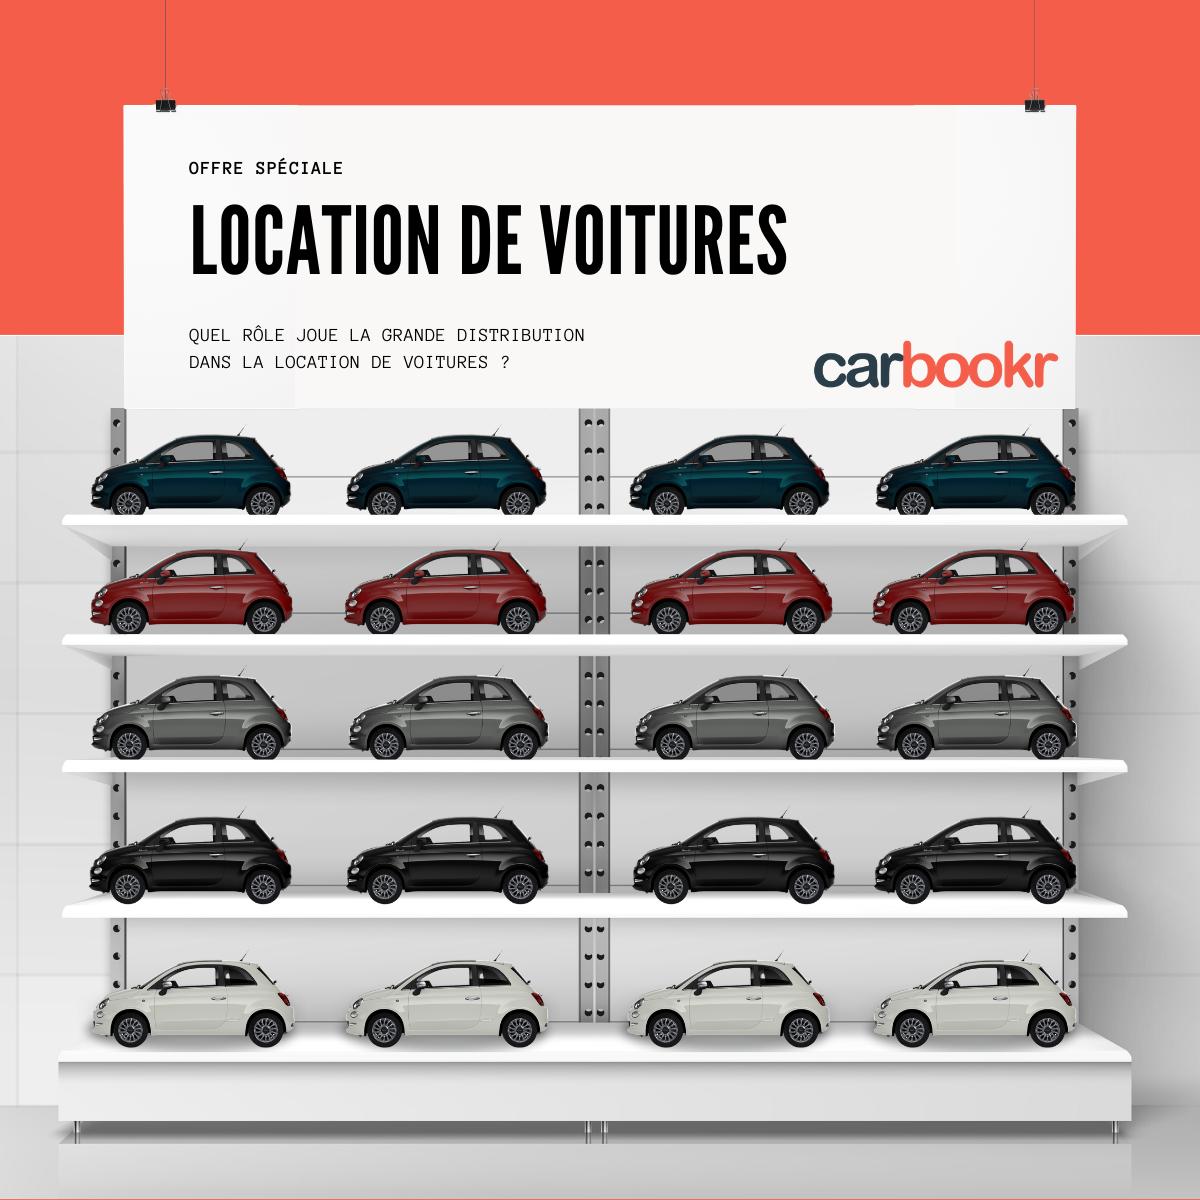 La grande distribution & la location de voitures